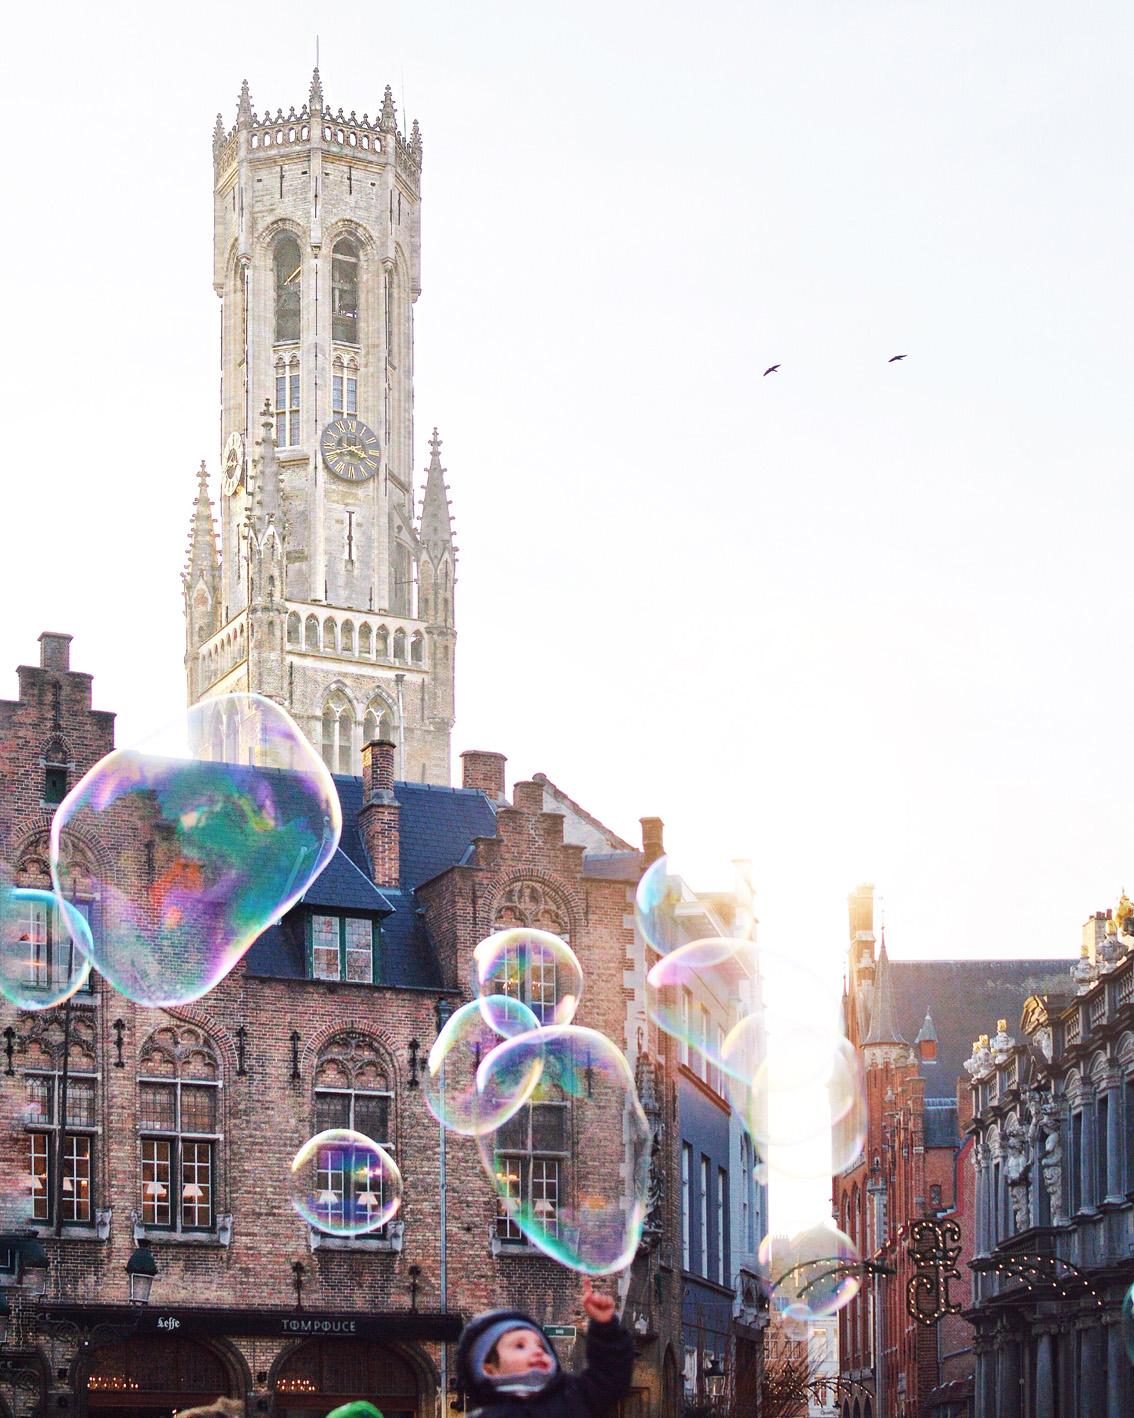 36-1 Un weekend in Belgio. Alla scoperta delle Fiandre: Bruges .